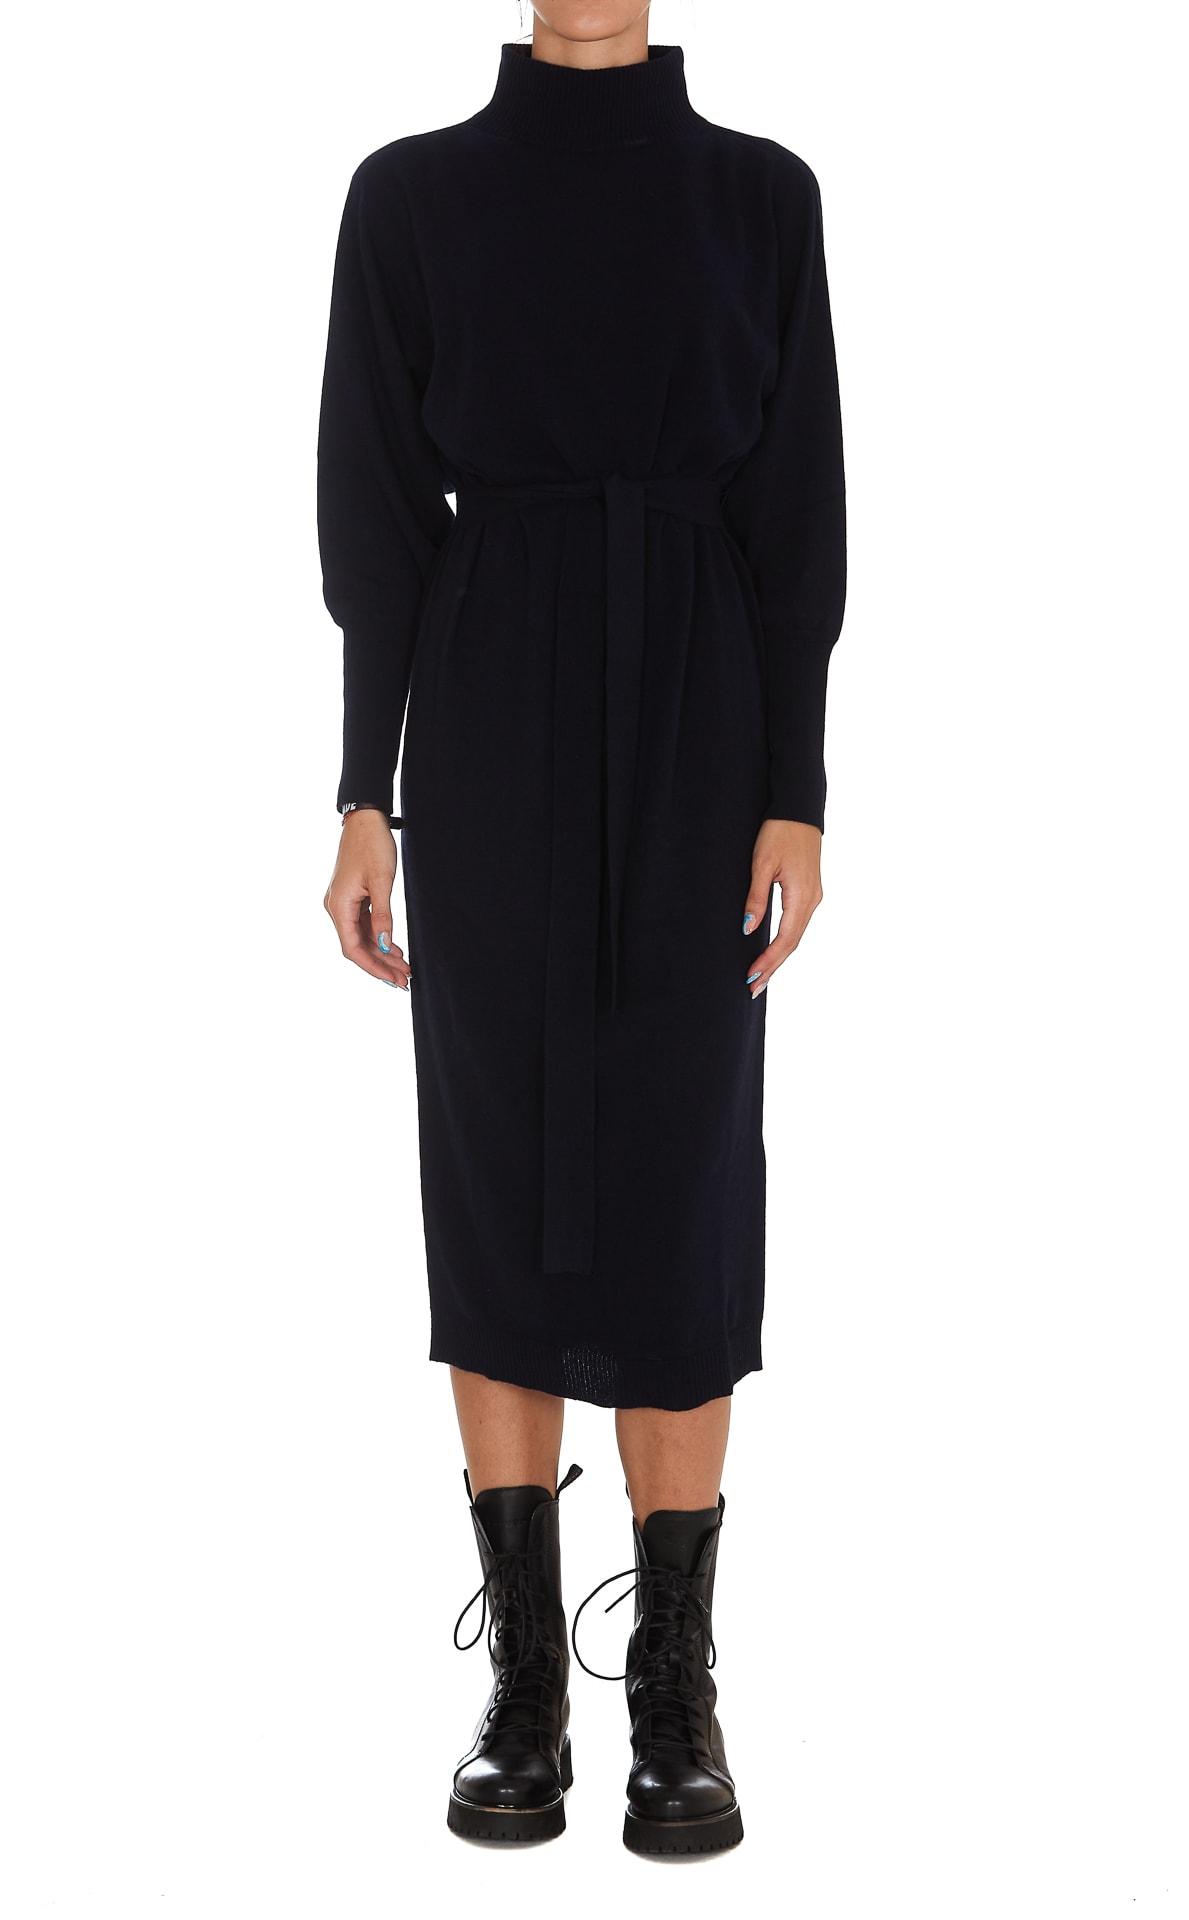 Asensation Dress